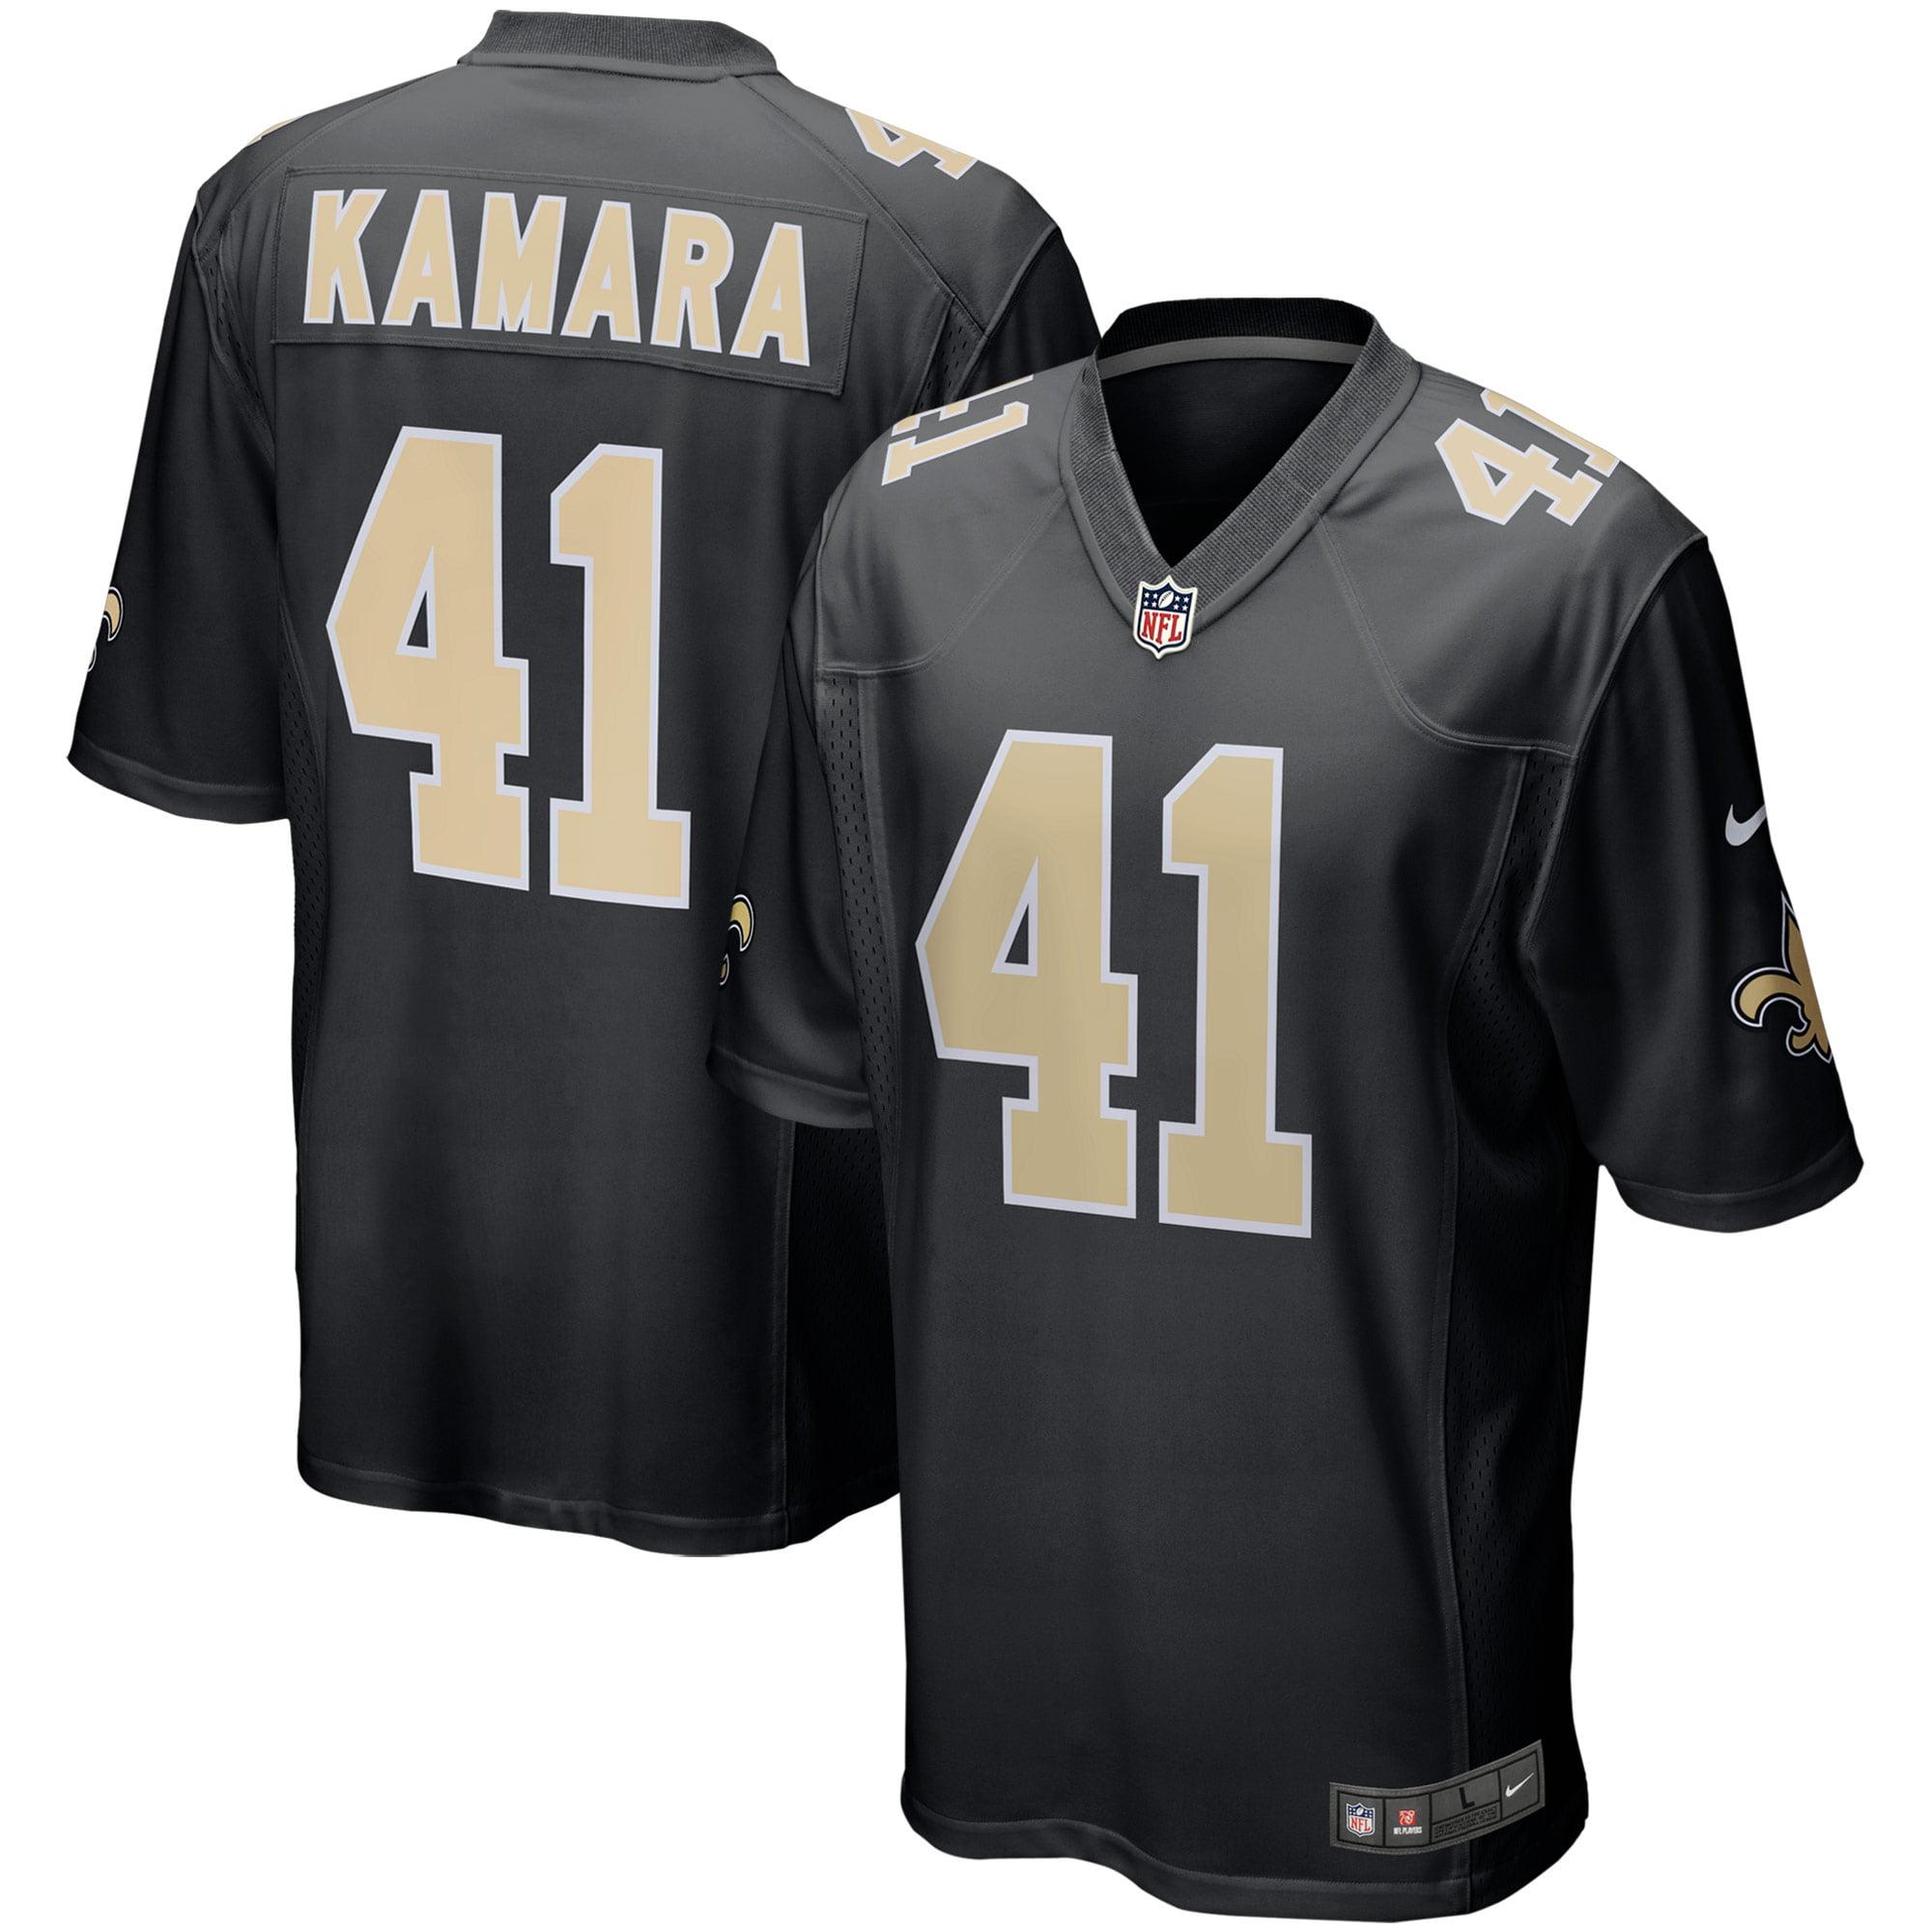 Alvin Kamara New Orleans Saints Nike Event Game Jersey - Black